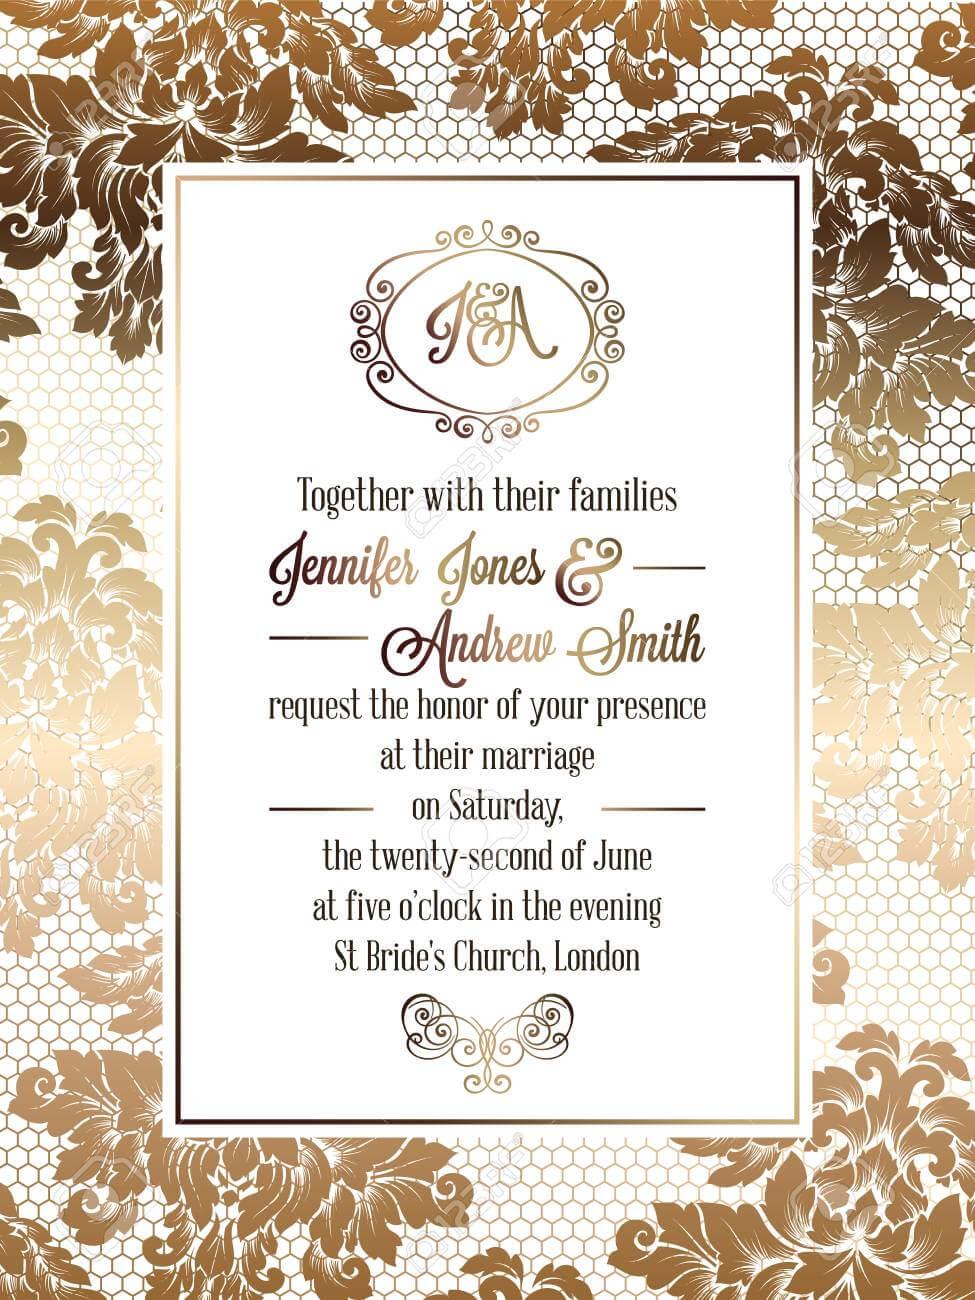 Vintage Baroque Style Wedding Invitation Card Template.. Elegant.. For Invitation Cards Templates For Marriage